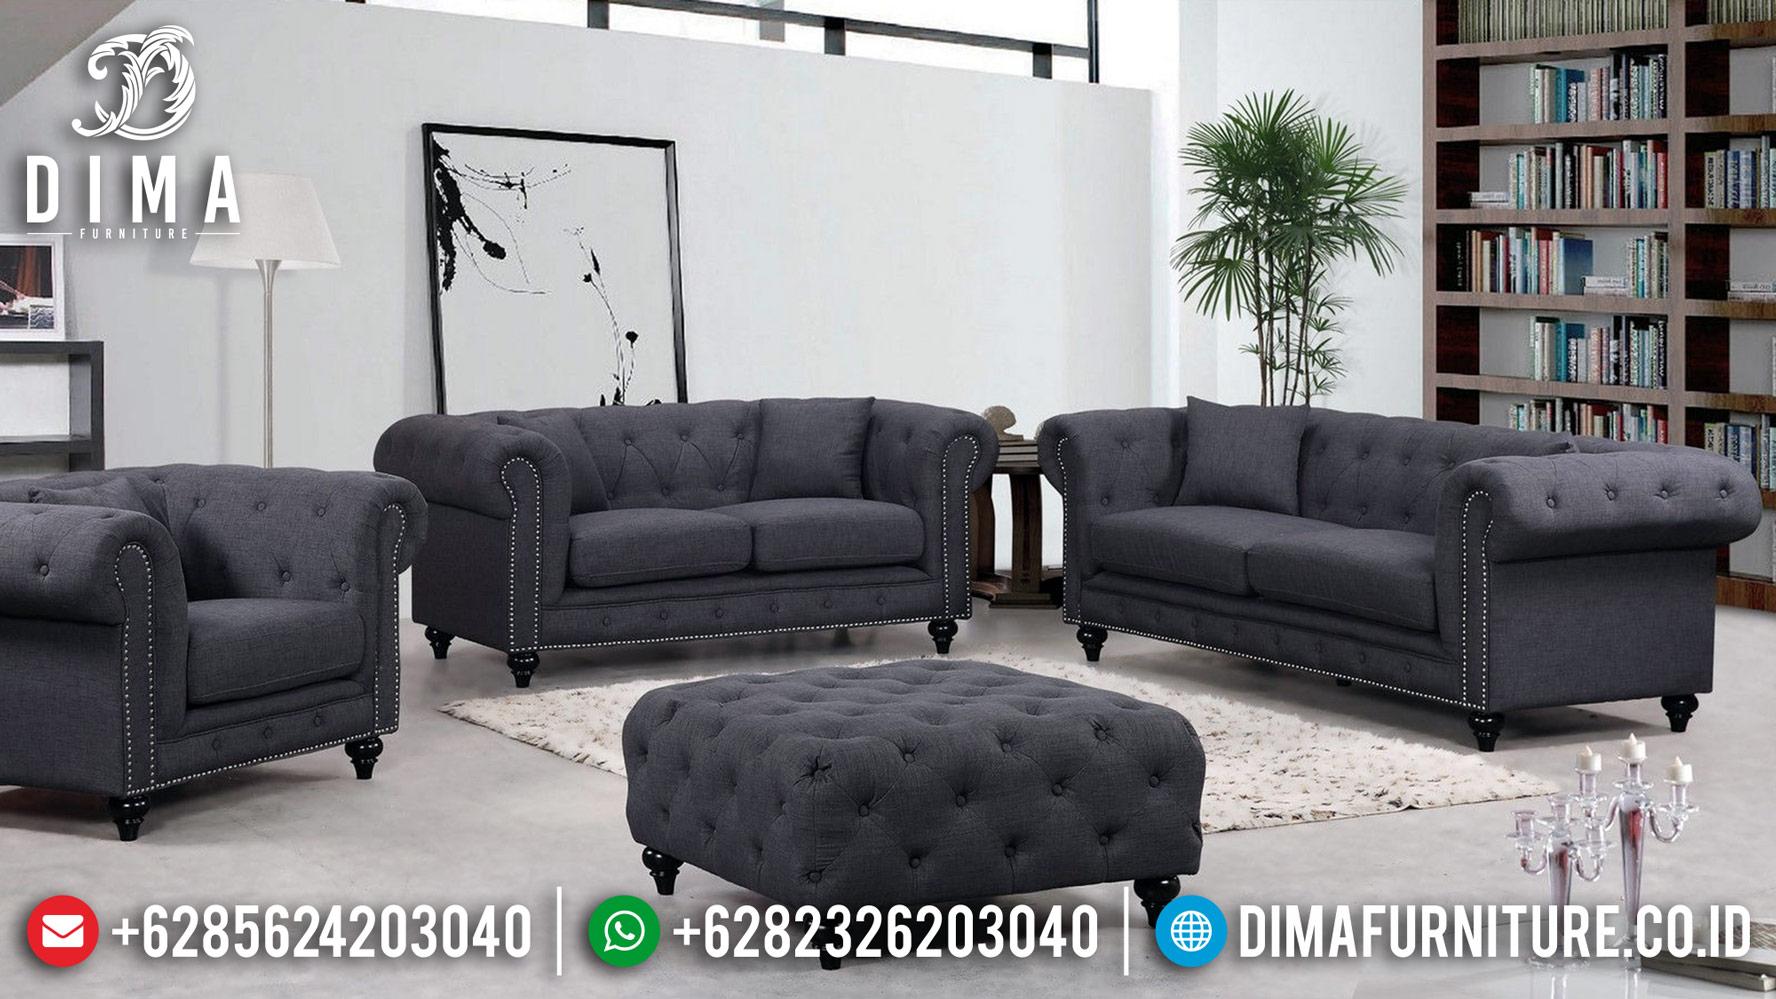 Desain Sofa Tamu Chesterfield Terbaru Modern Minimalis Luxury MM-0670